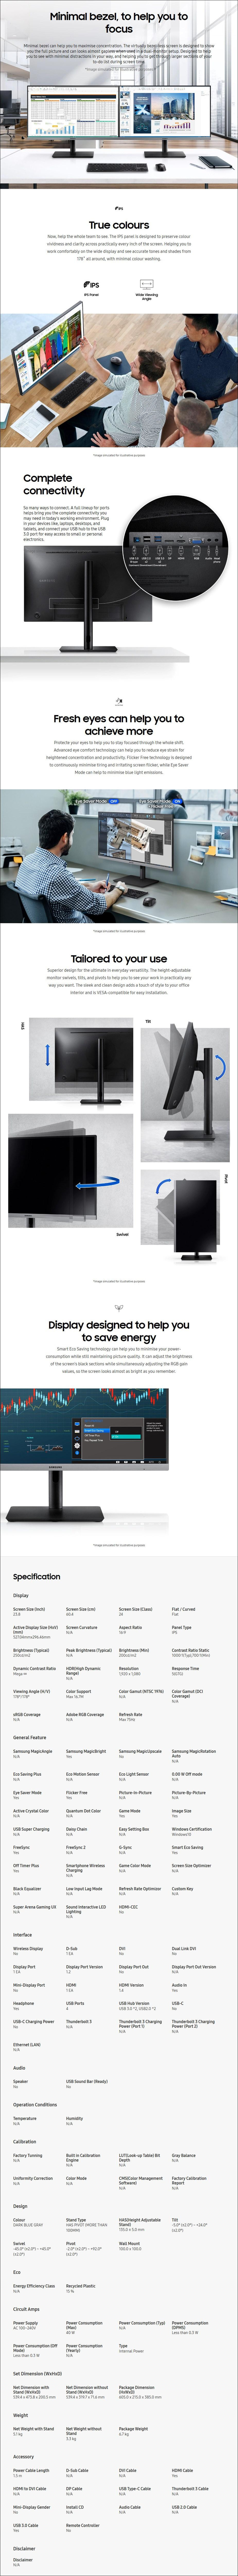 "Samsung R650FDE 23.8"" Full HD Narrow Bezel Ergonomic IPS Monitor - Overview 1"